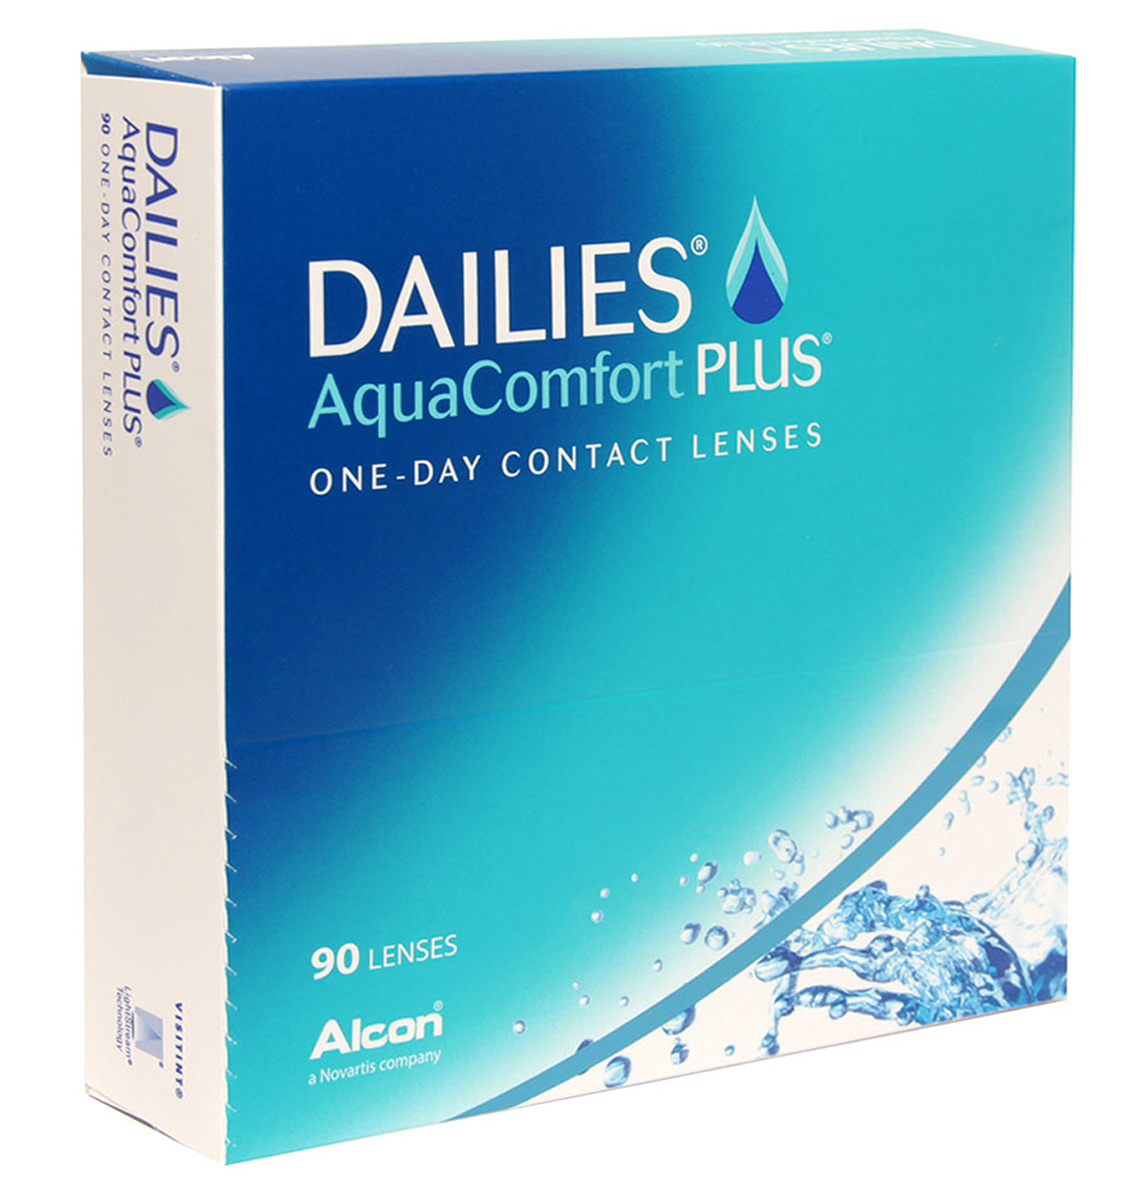 Alcon-CIBA Vision контактные линзы Dailies AquaComfort Plus (90шт / 8.7 / 14.0 / -4.25)